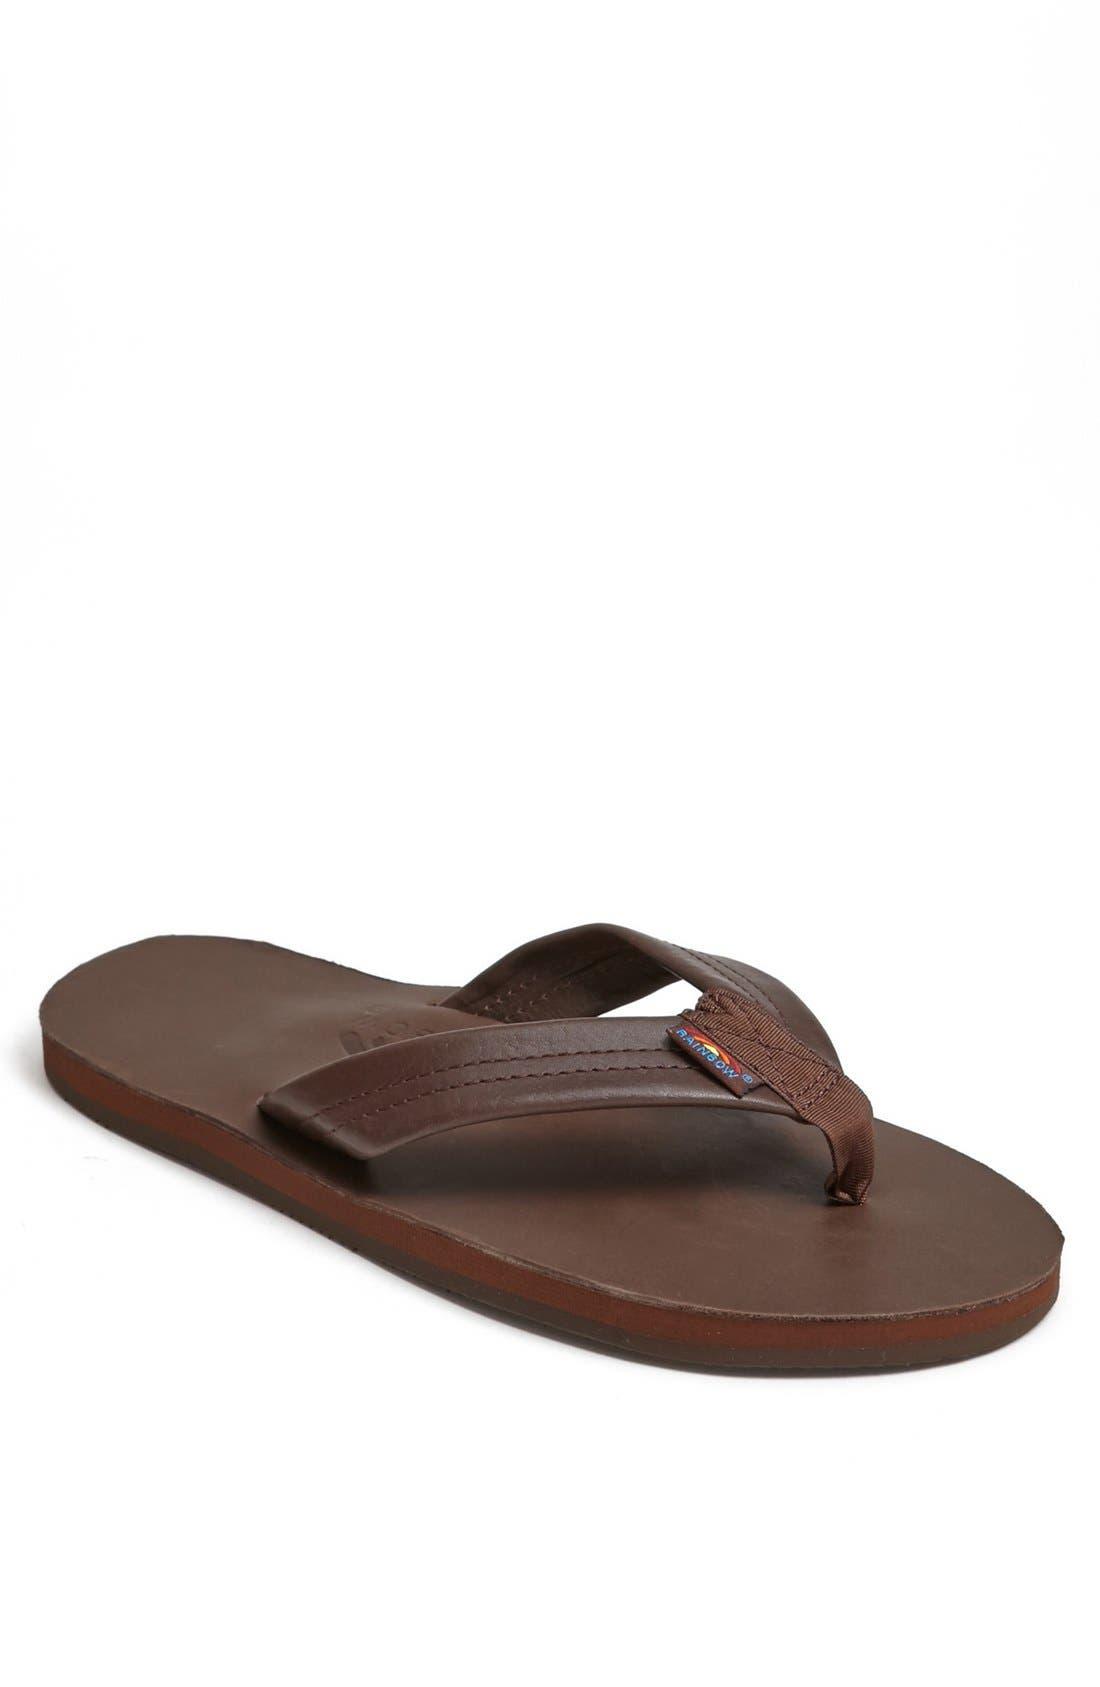 15a5802c8 Men s Sandals